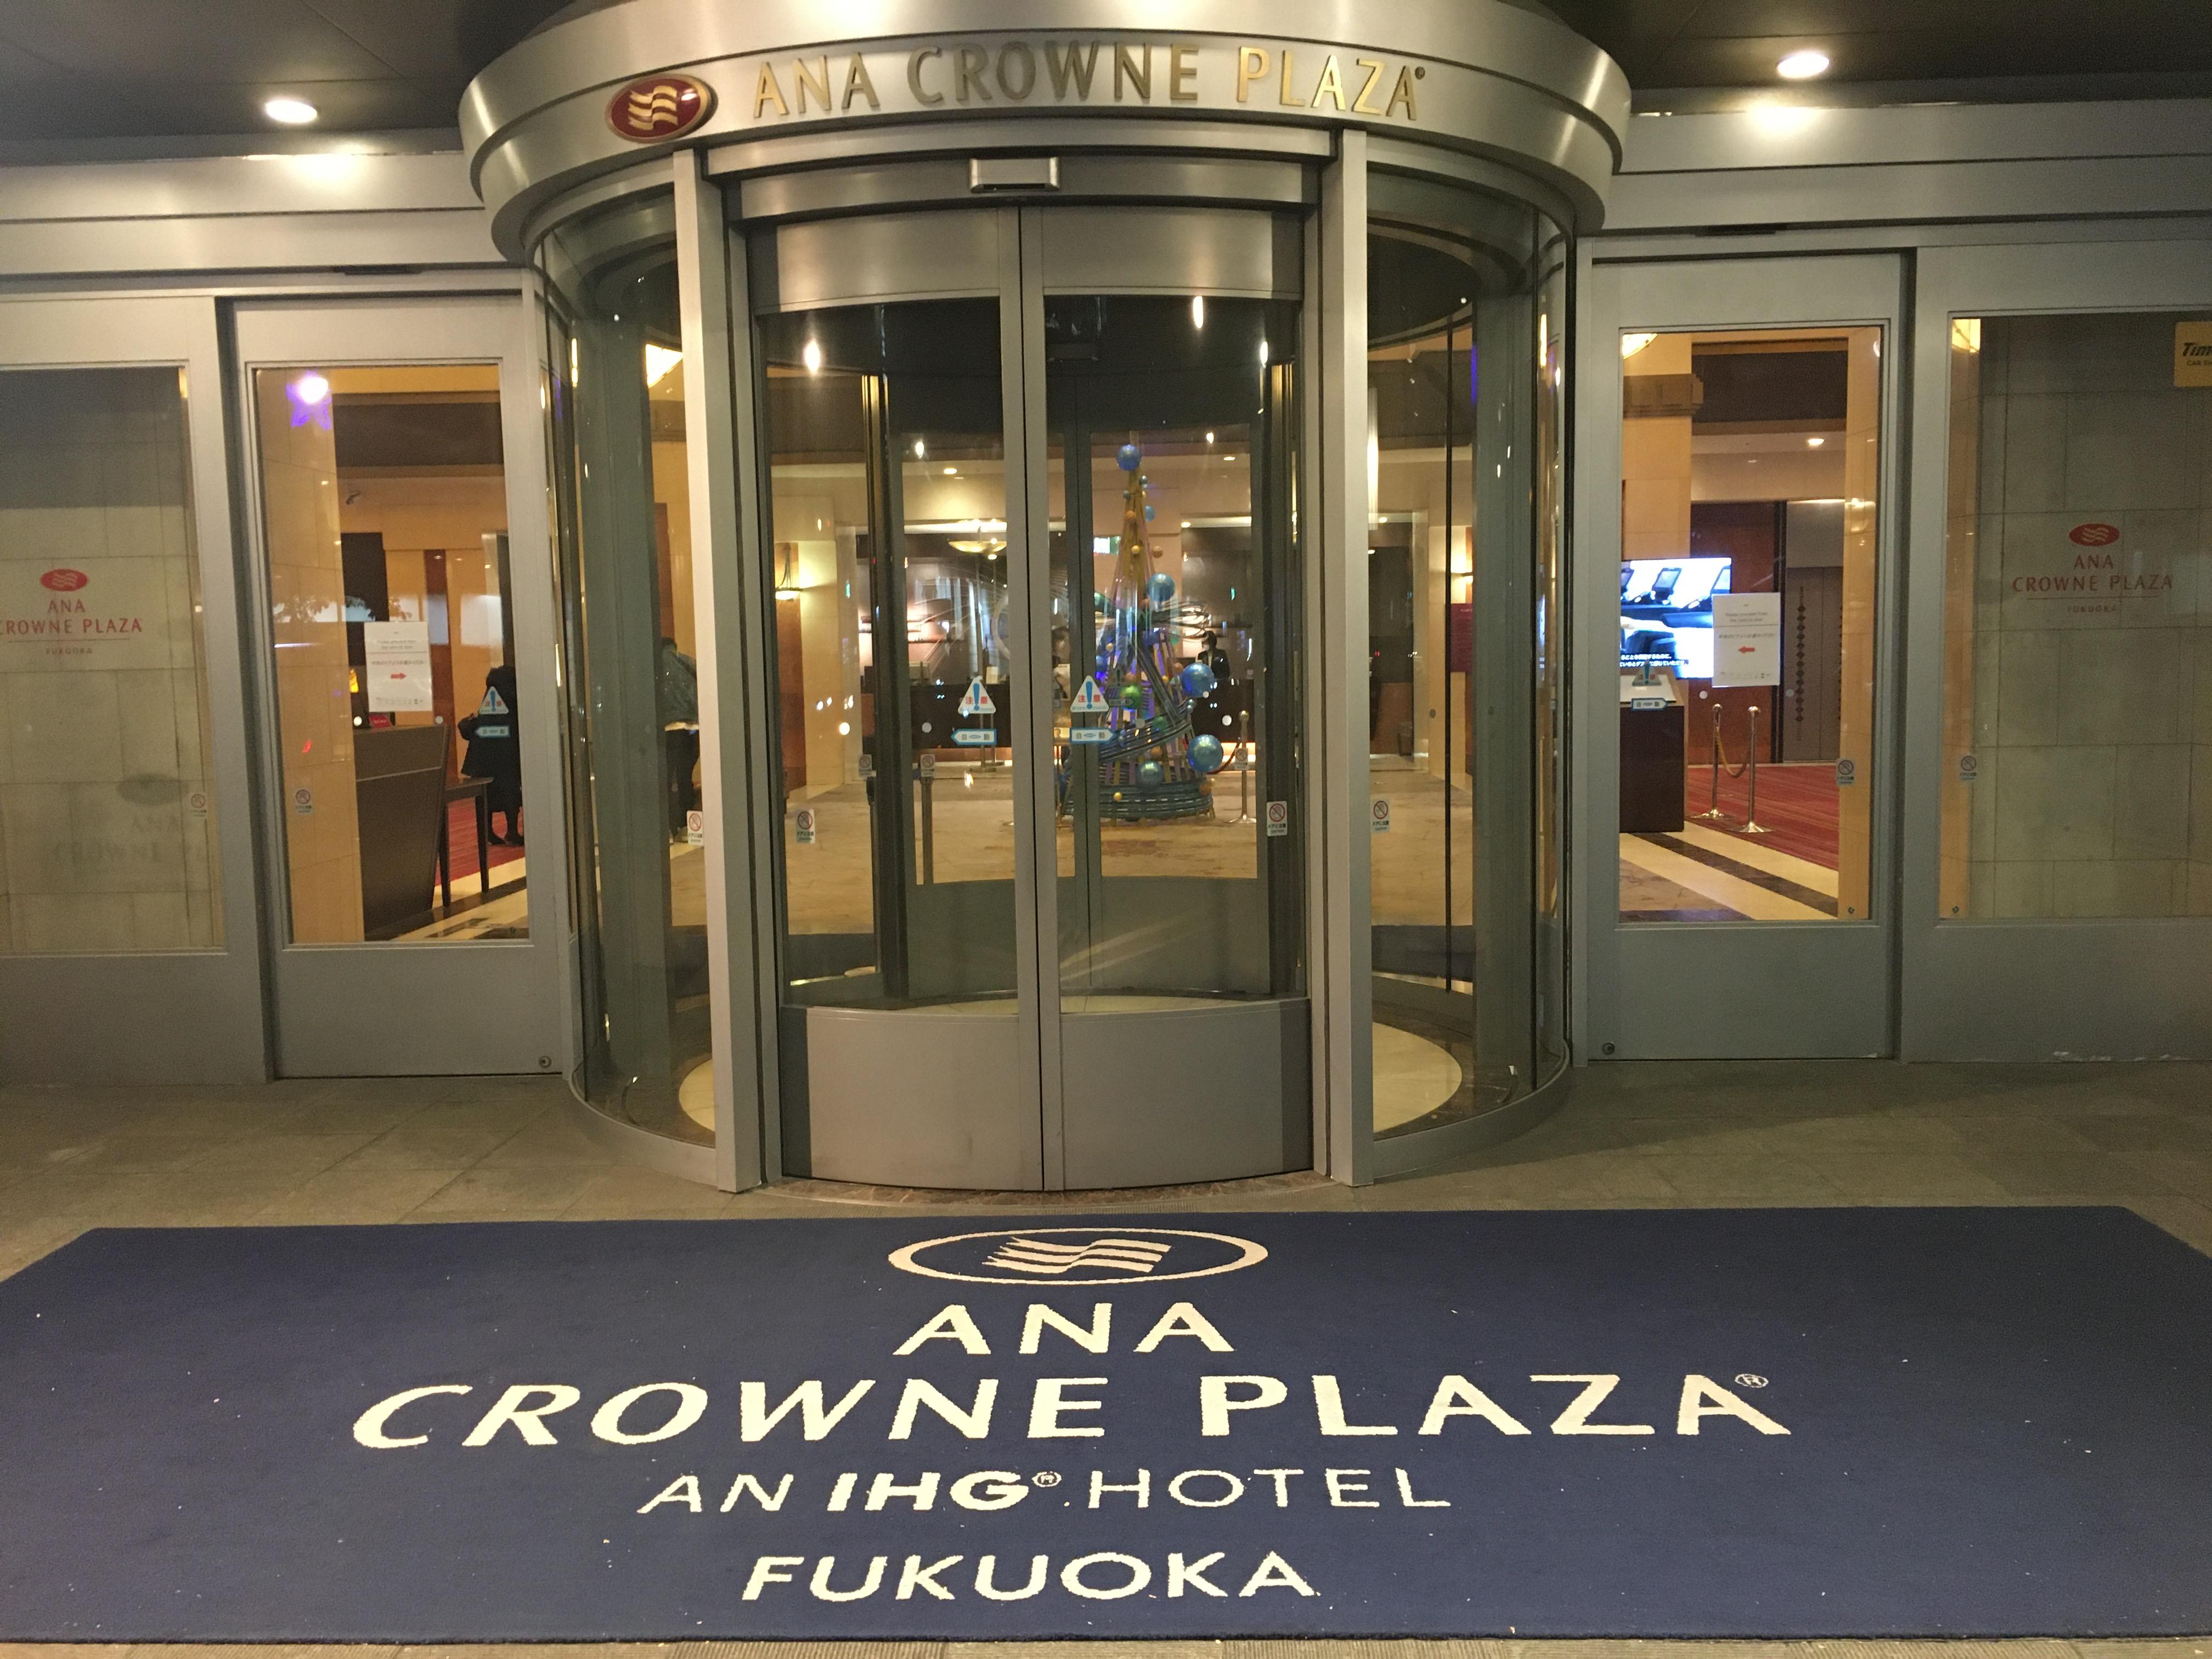 Hotel Review : ANAクラウンプラザホテル 福岡 (ANA Crowne Plaza Hotel Fukuoka)